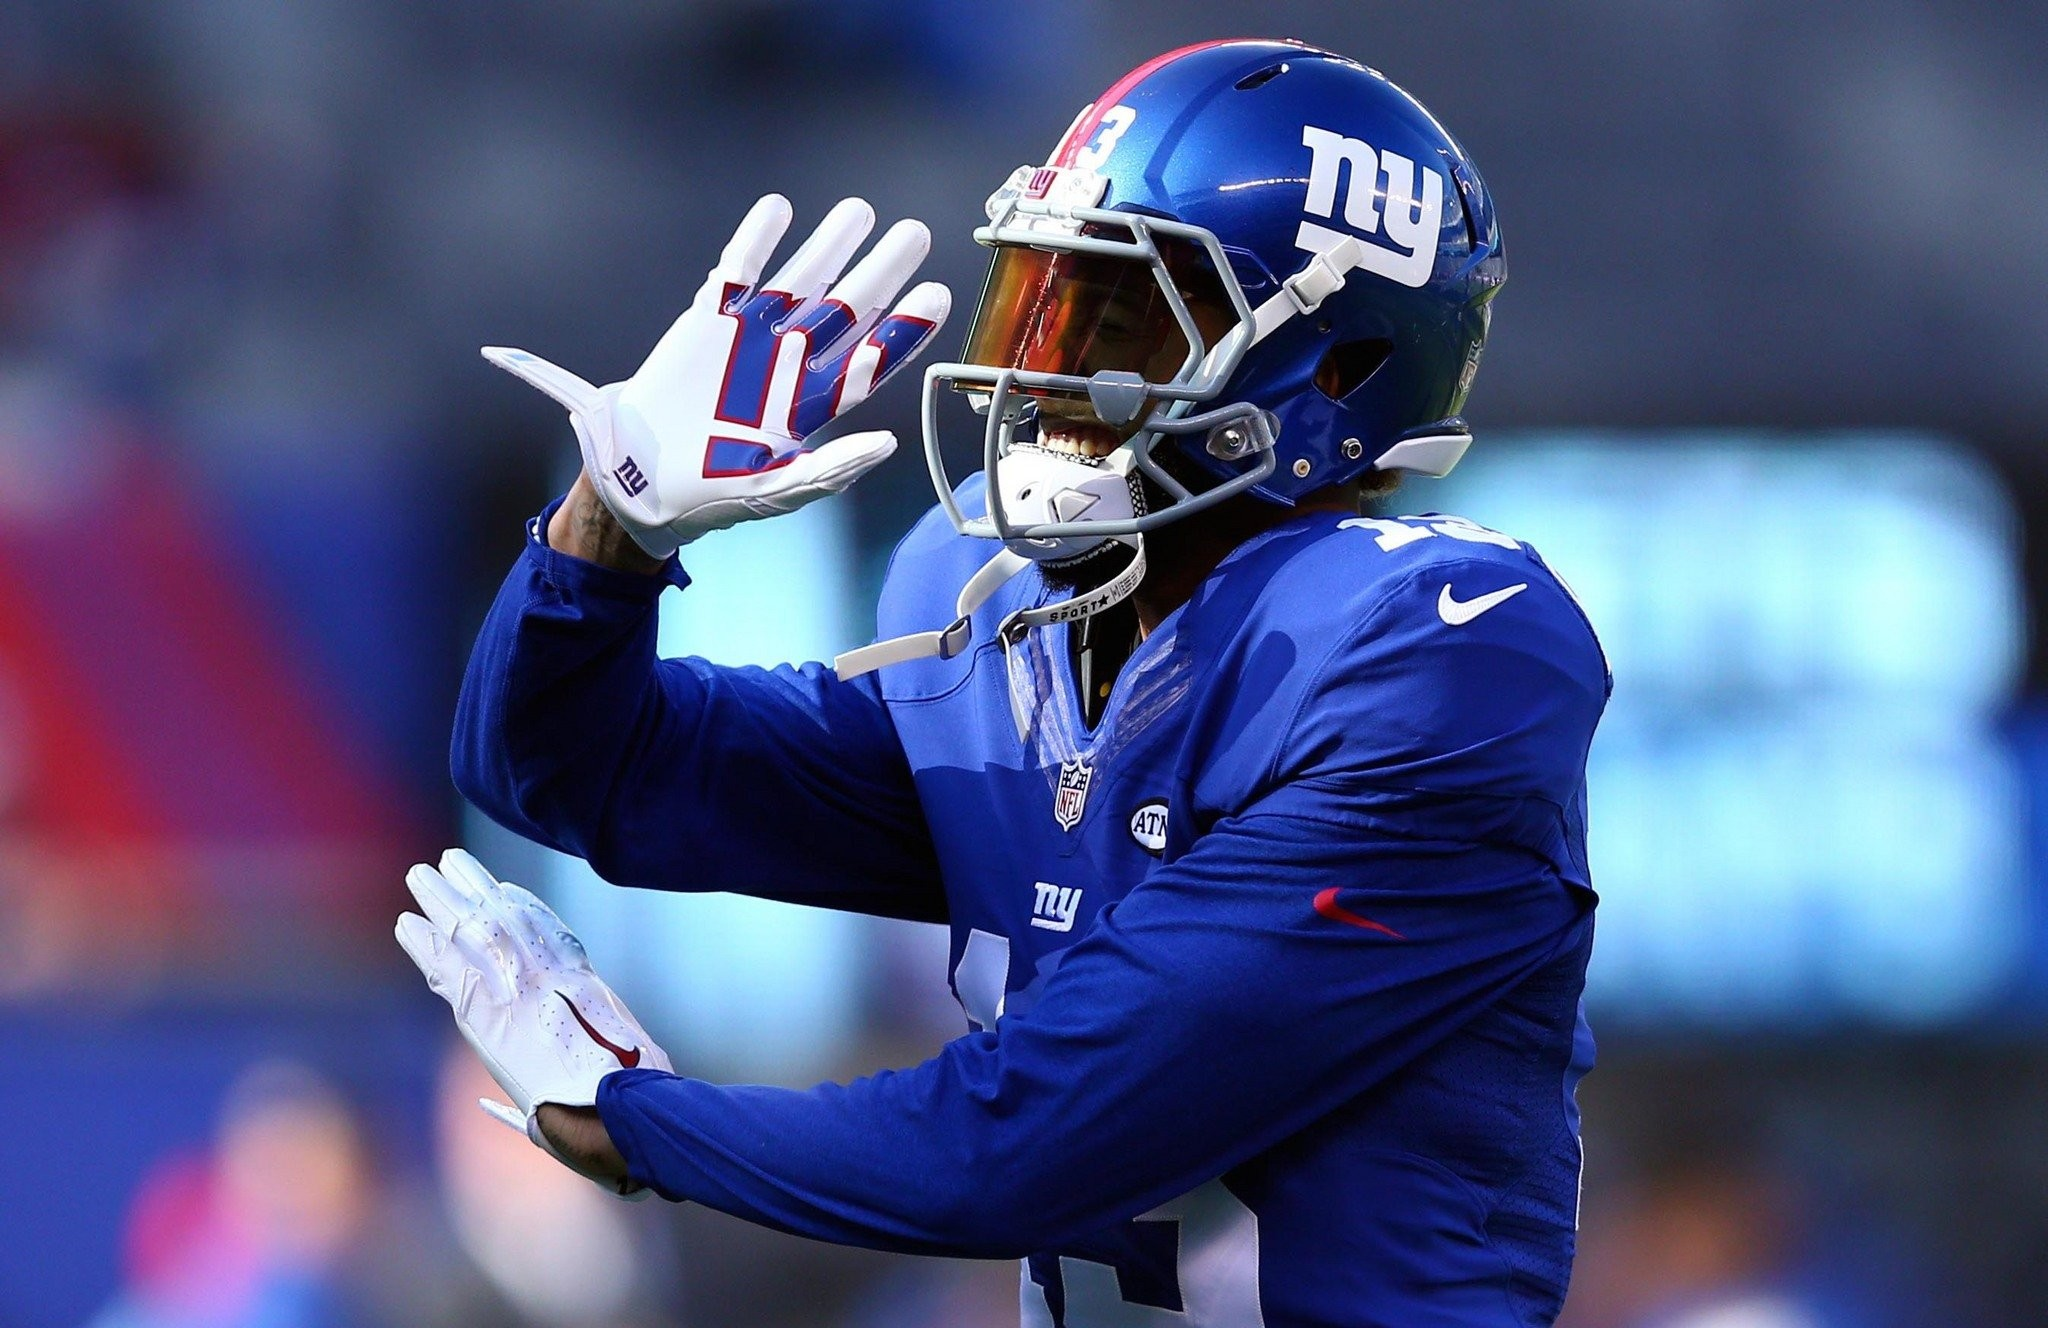 WATCH: Giants' Odell Beckham Jr. makes another sick 1-handed catch vs. Jets    NJ.com